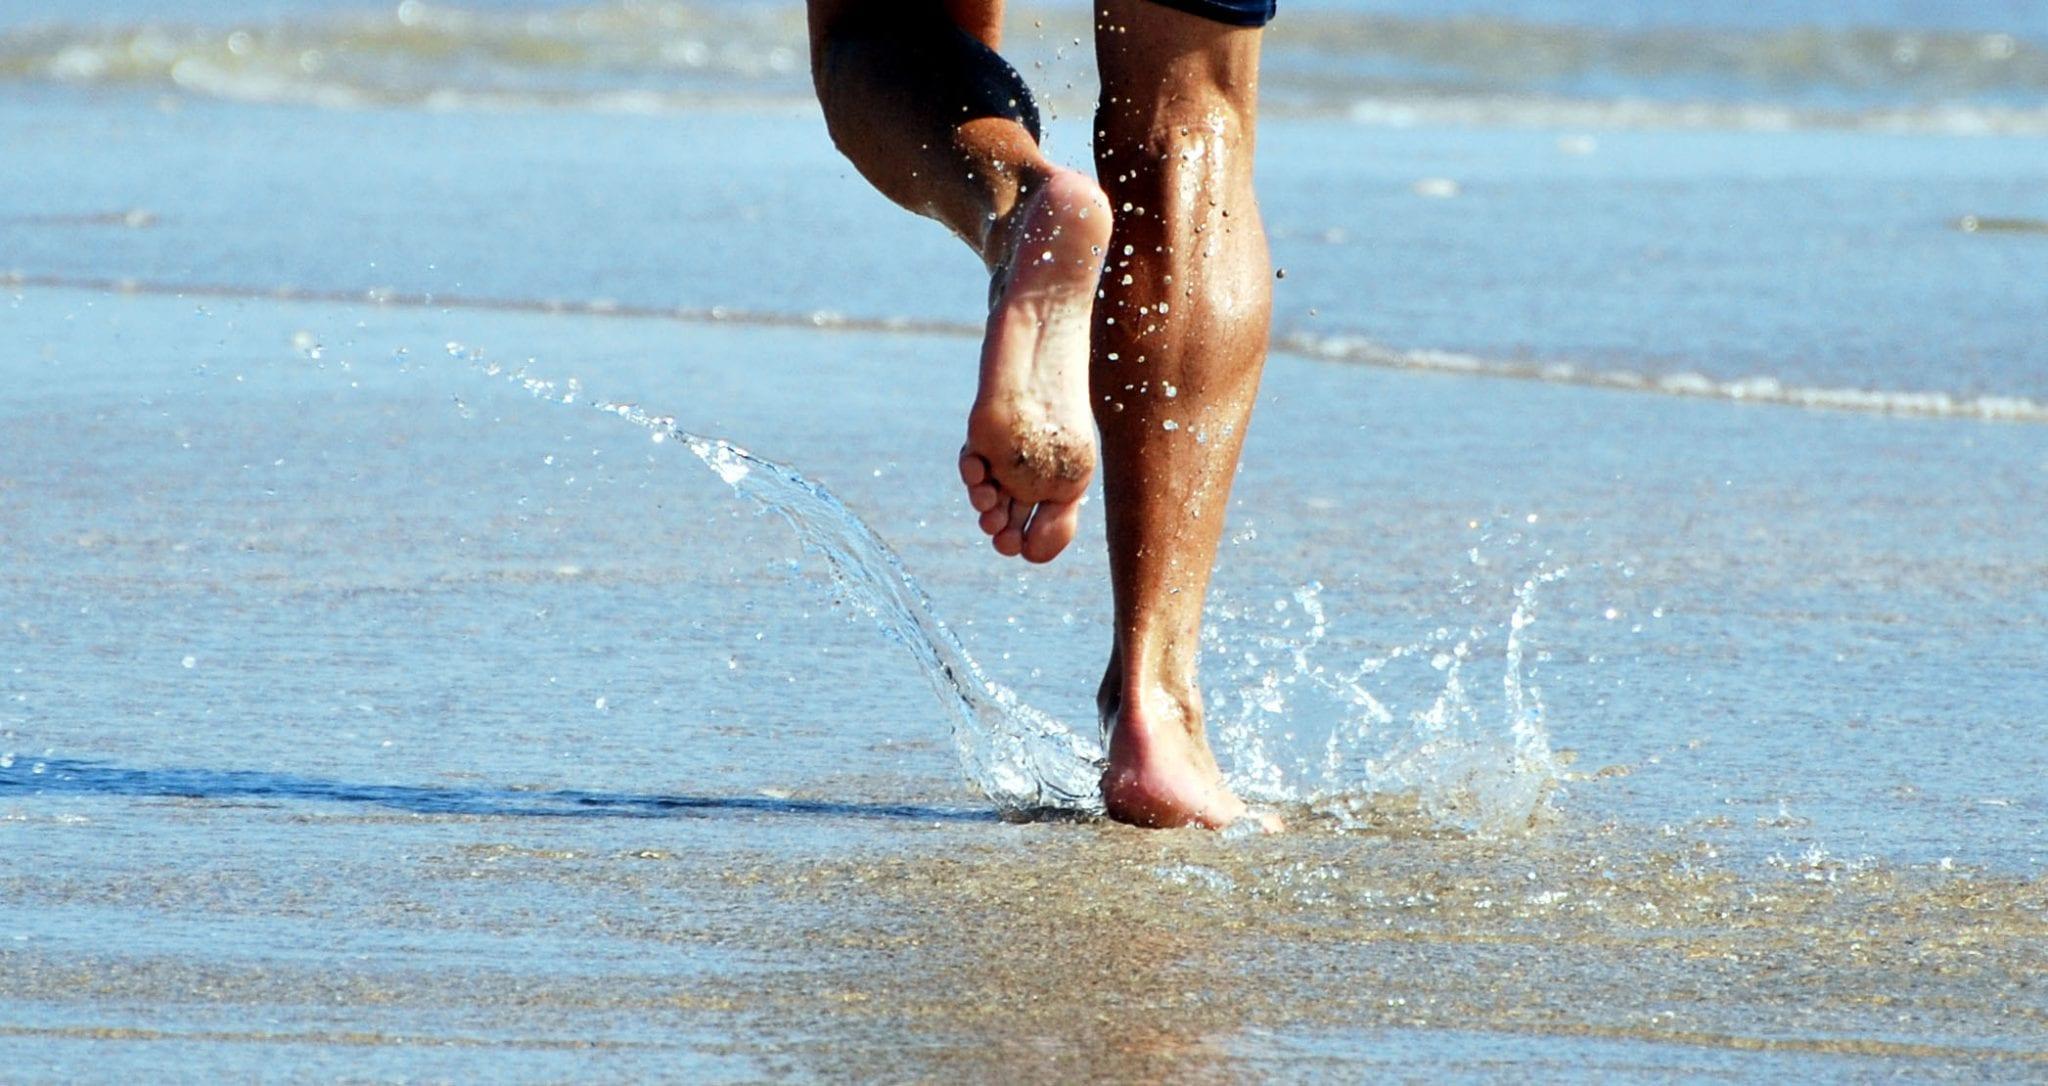 deporte playa la barrosa chiclana